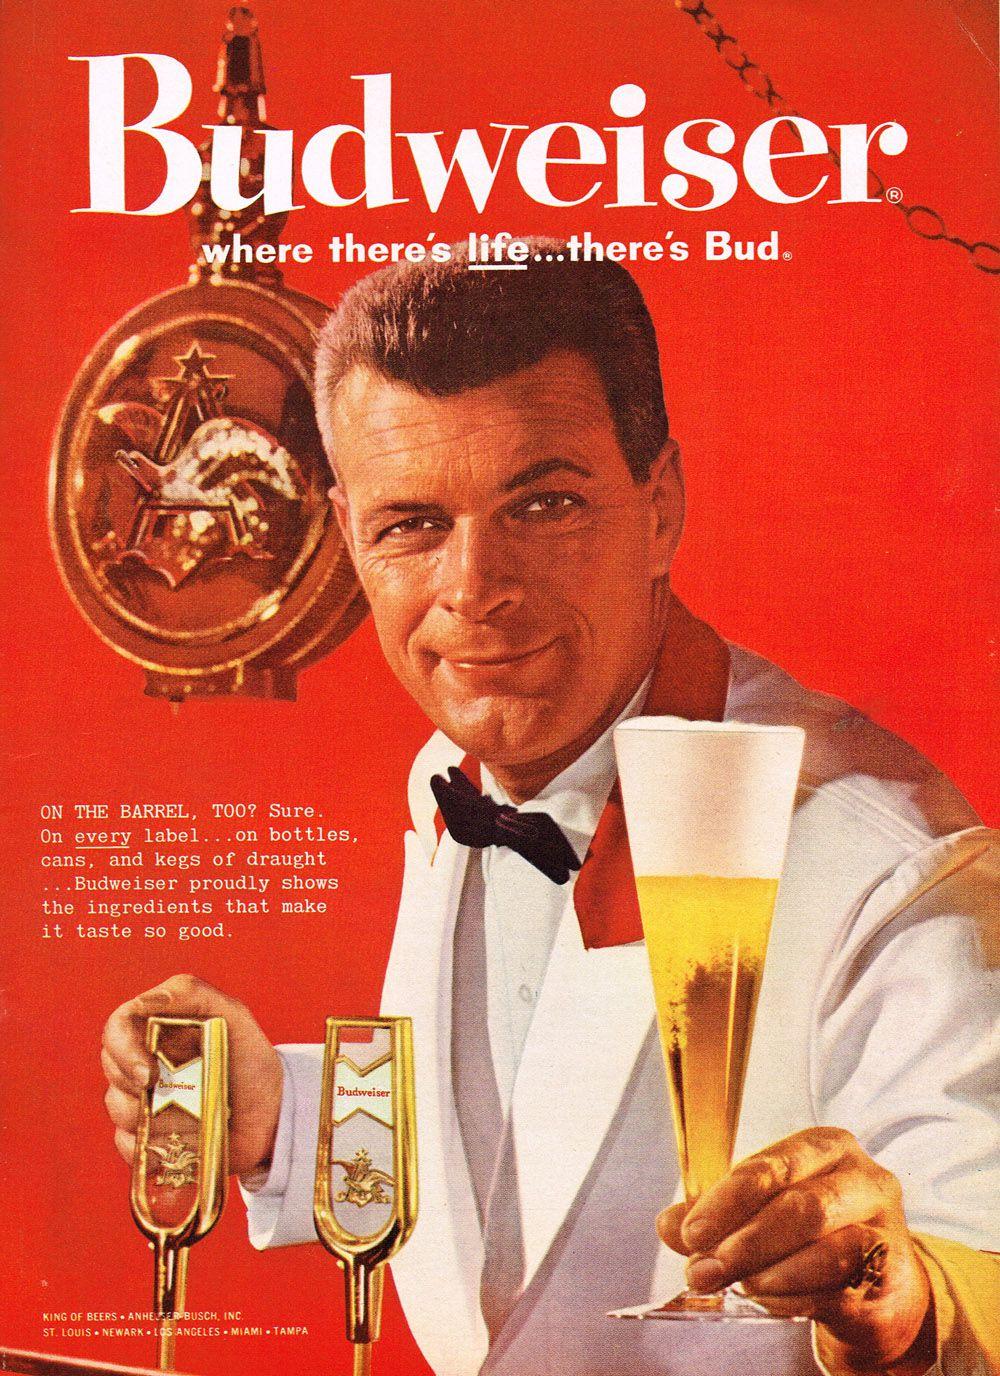 1960 Budweiser Ad.